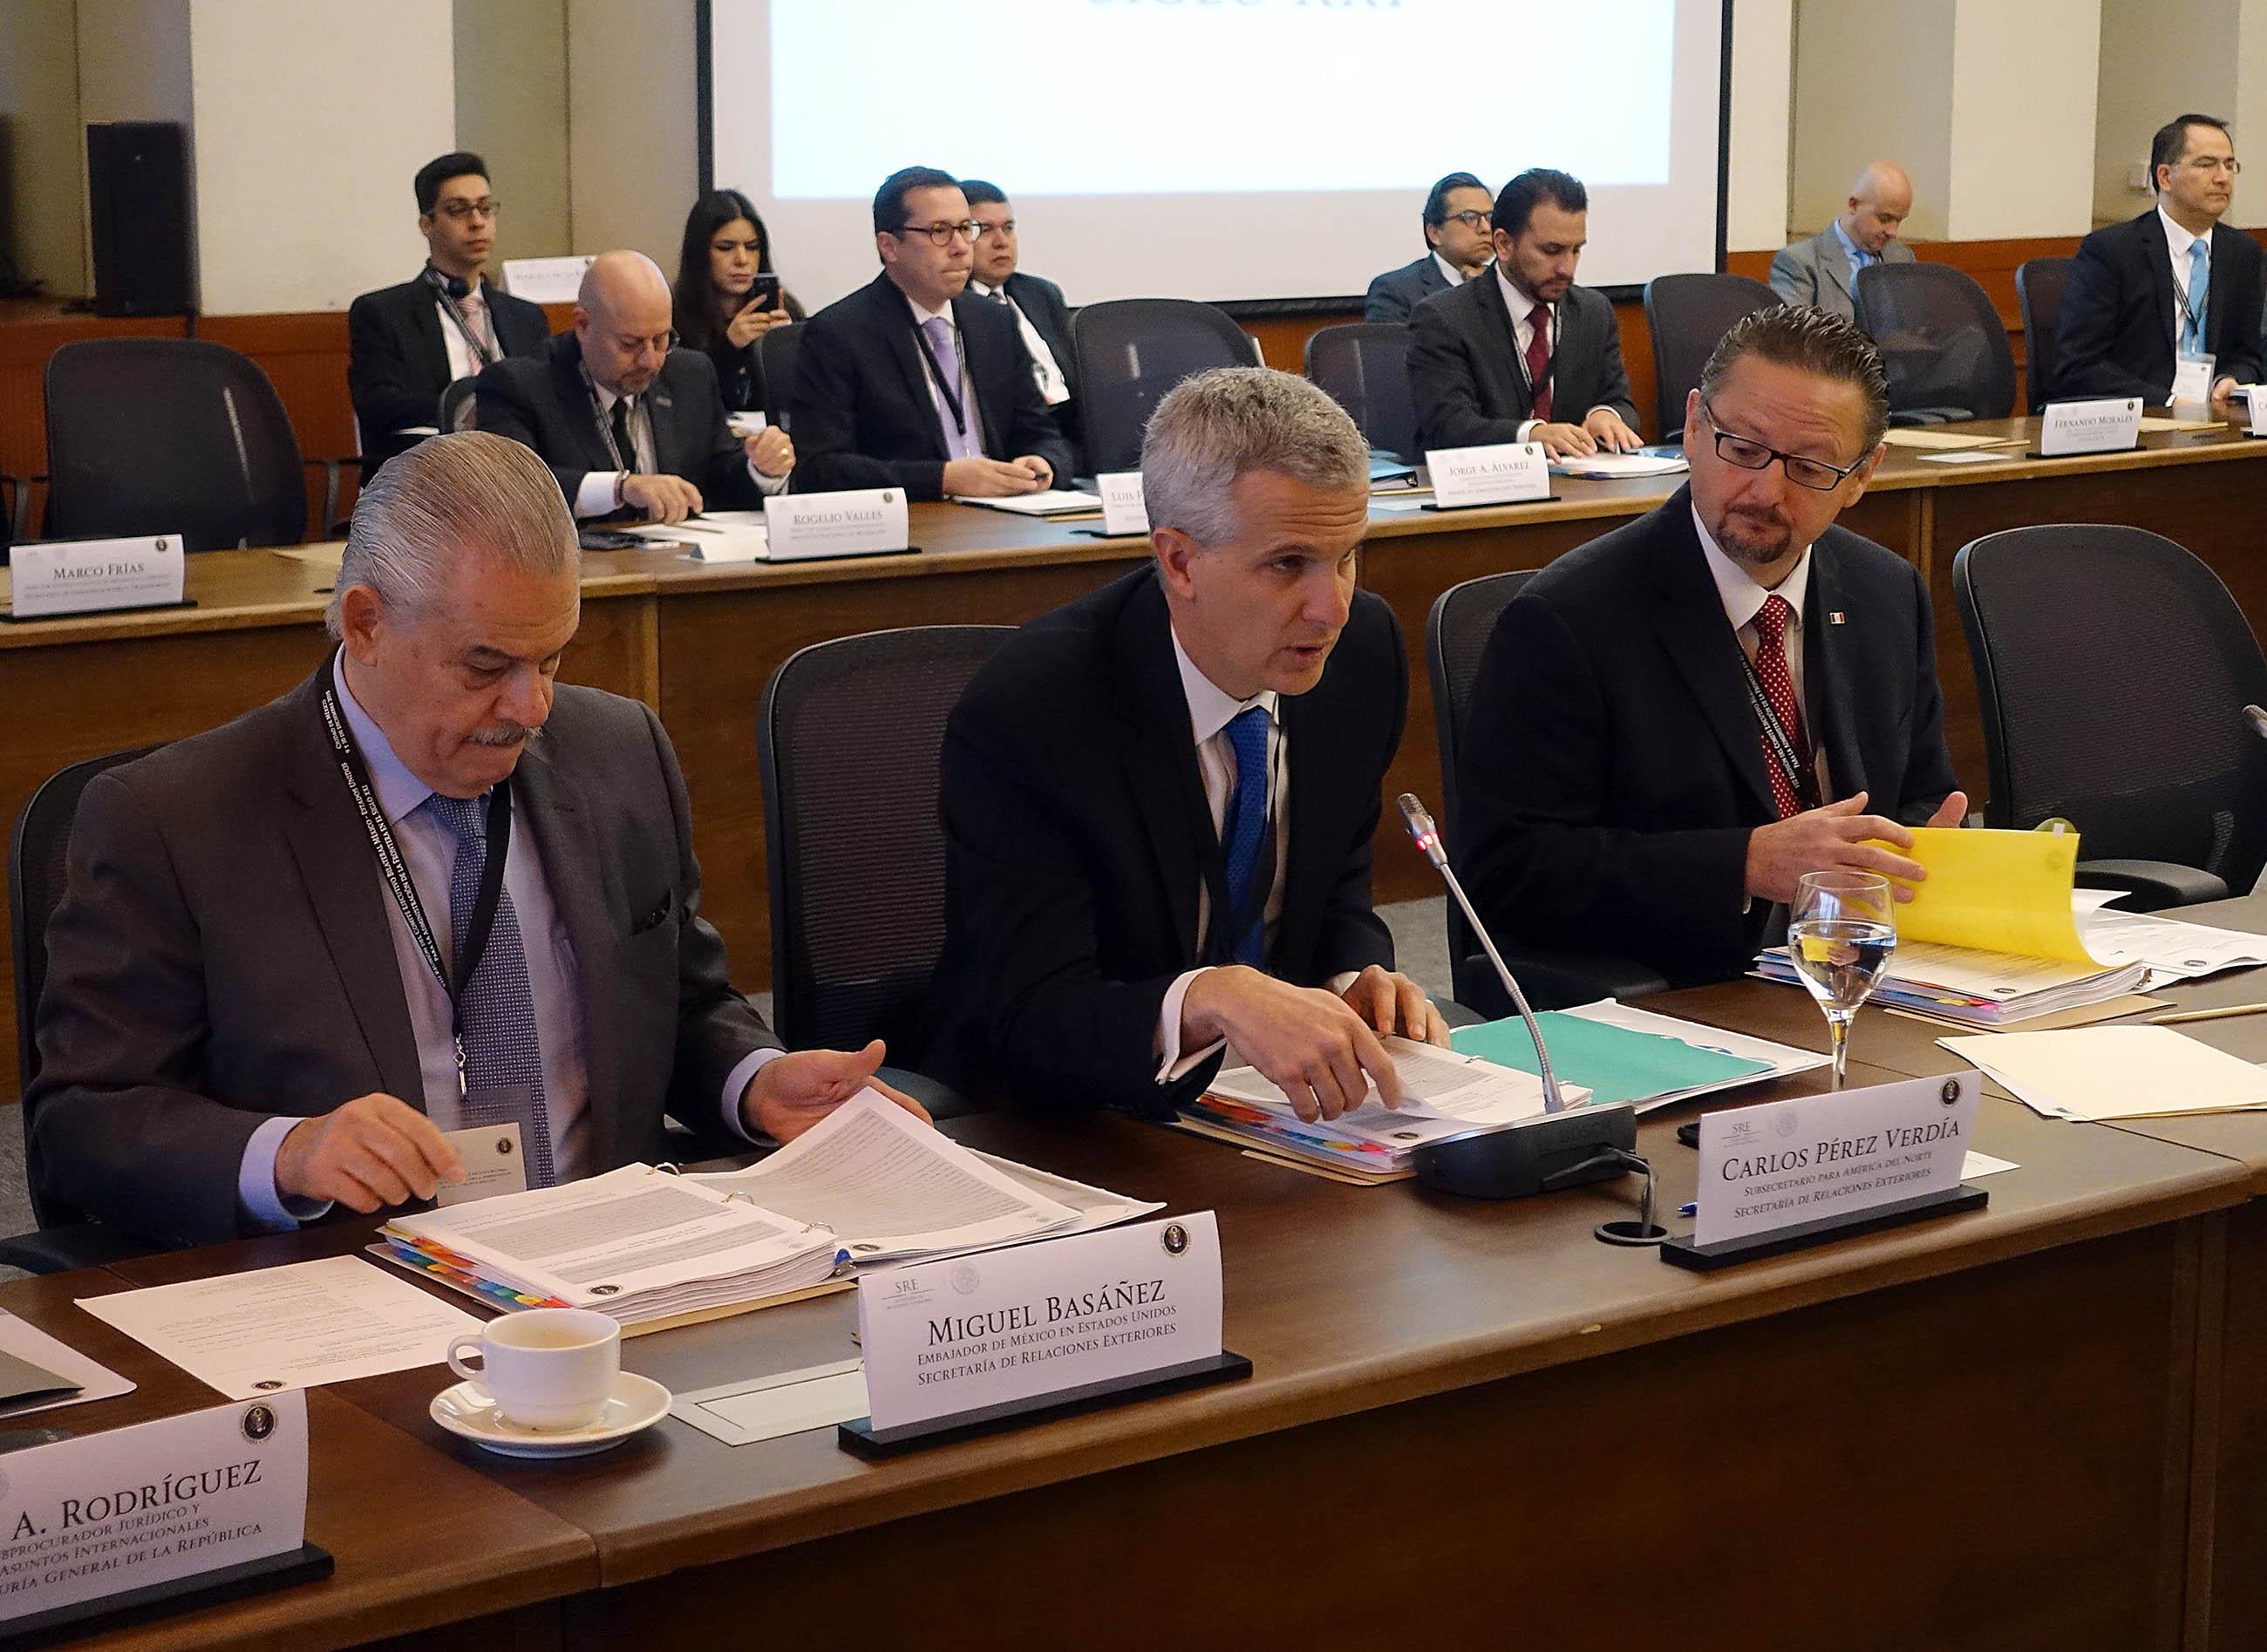 FOTO 2 Reuni n del Comit  Ejecutivo Bilateral de la Iniciativa para la Administraci n de la Frontera en el Siglo XXIjpg